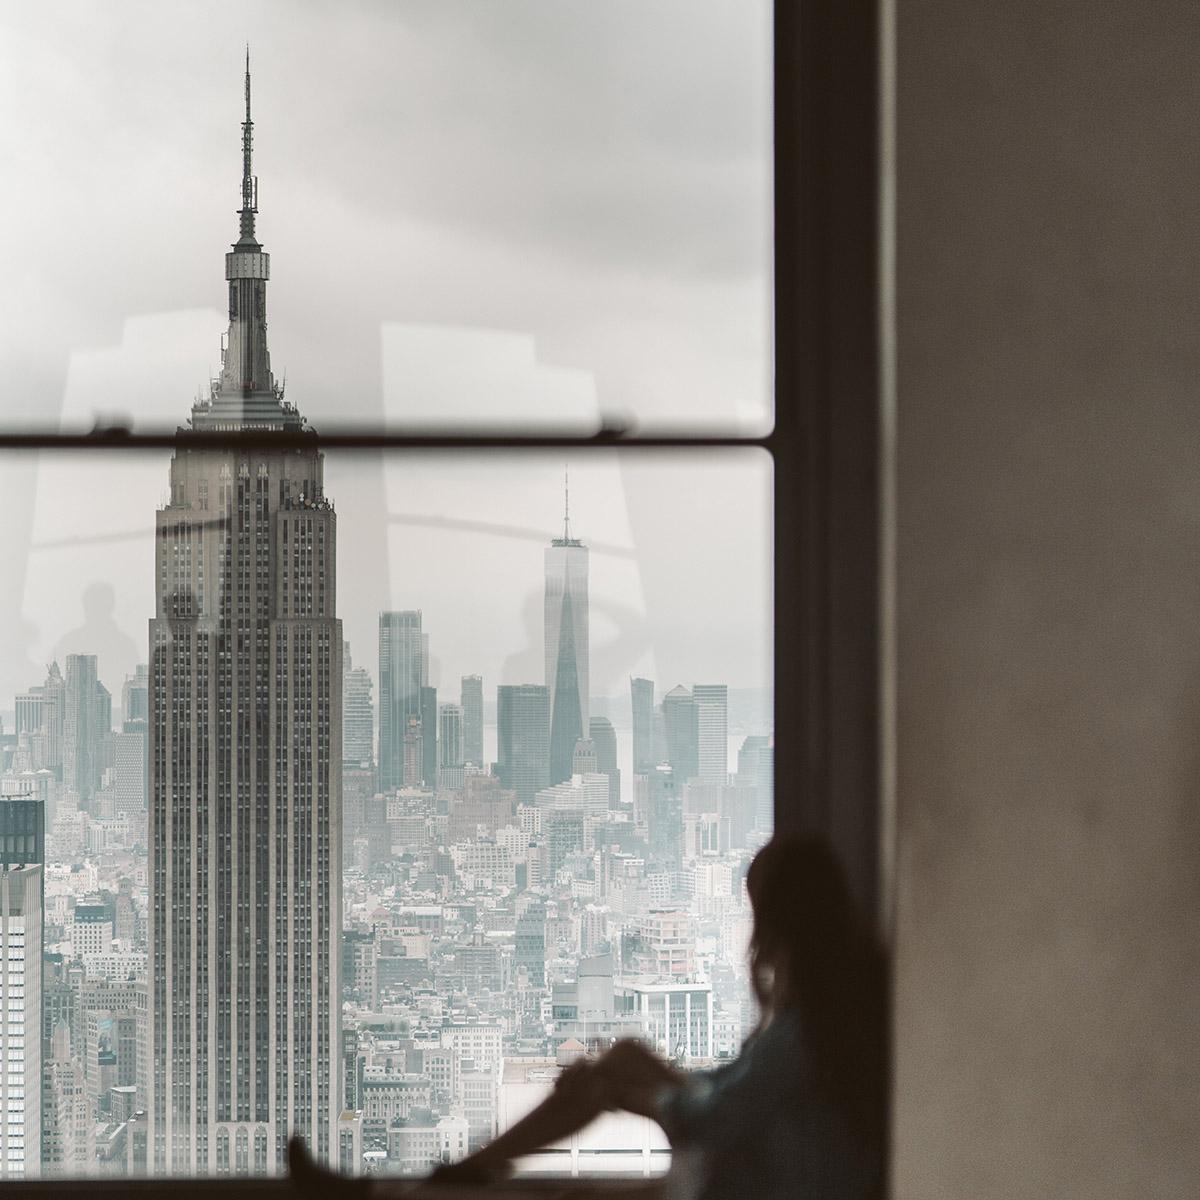 Bucket List Travel 2021 - New York City